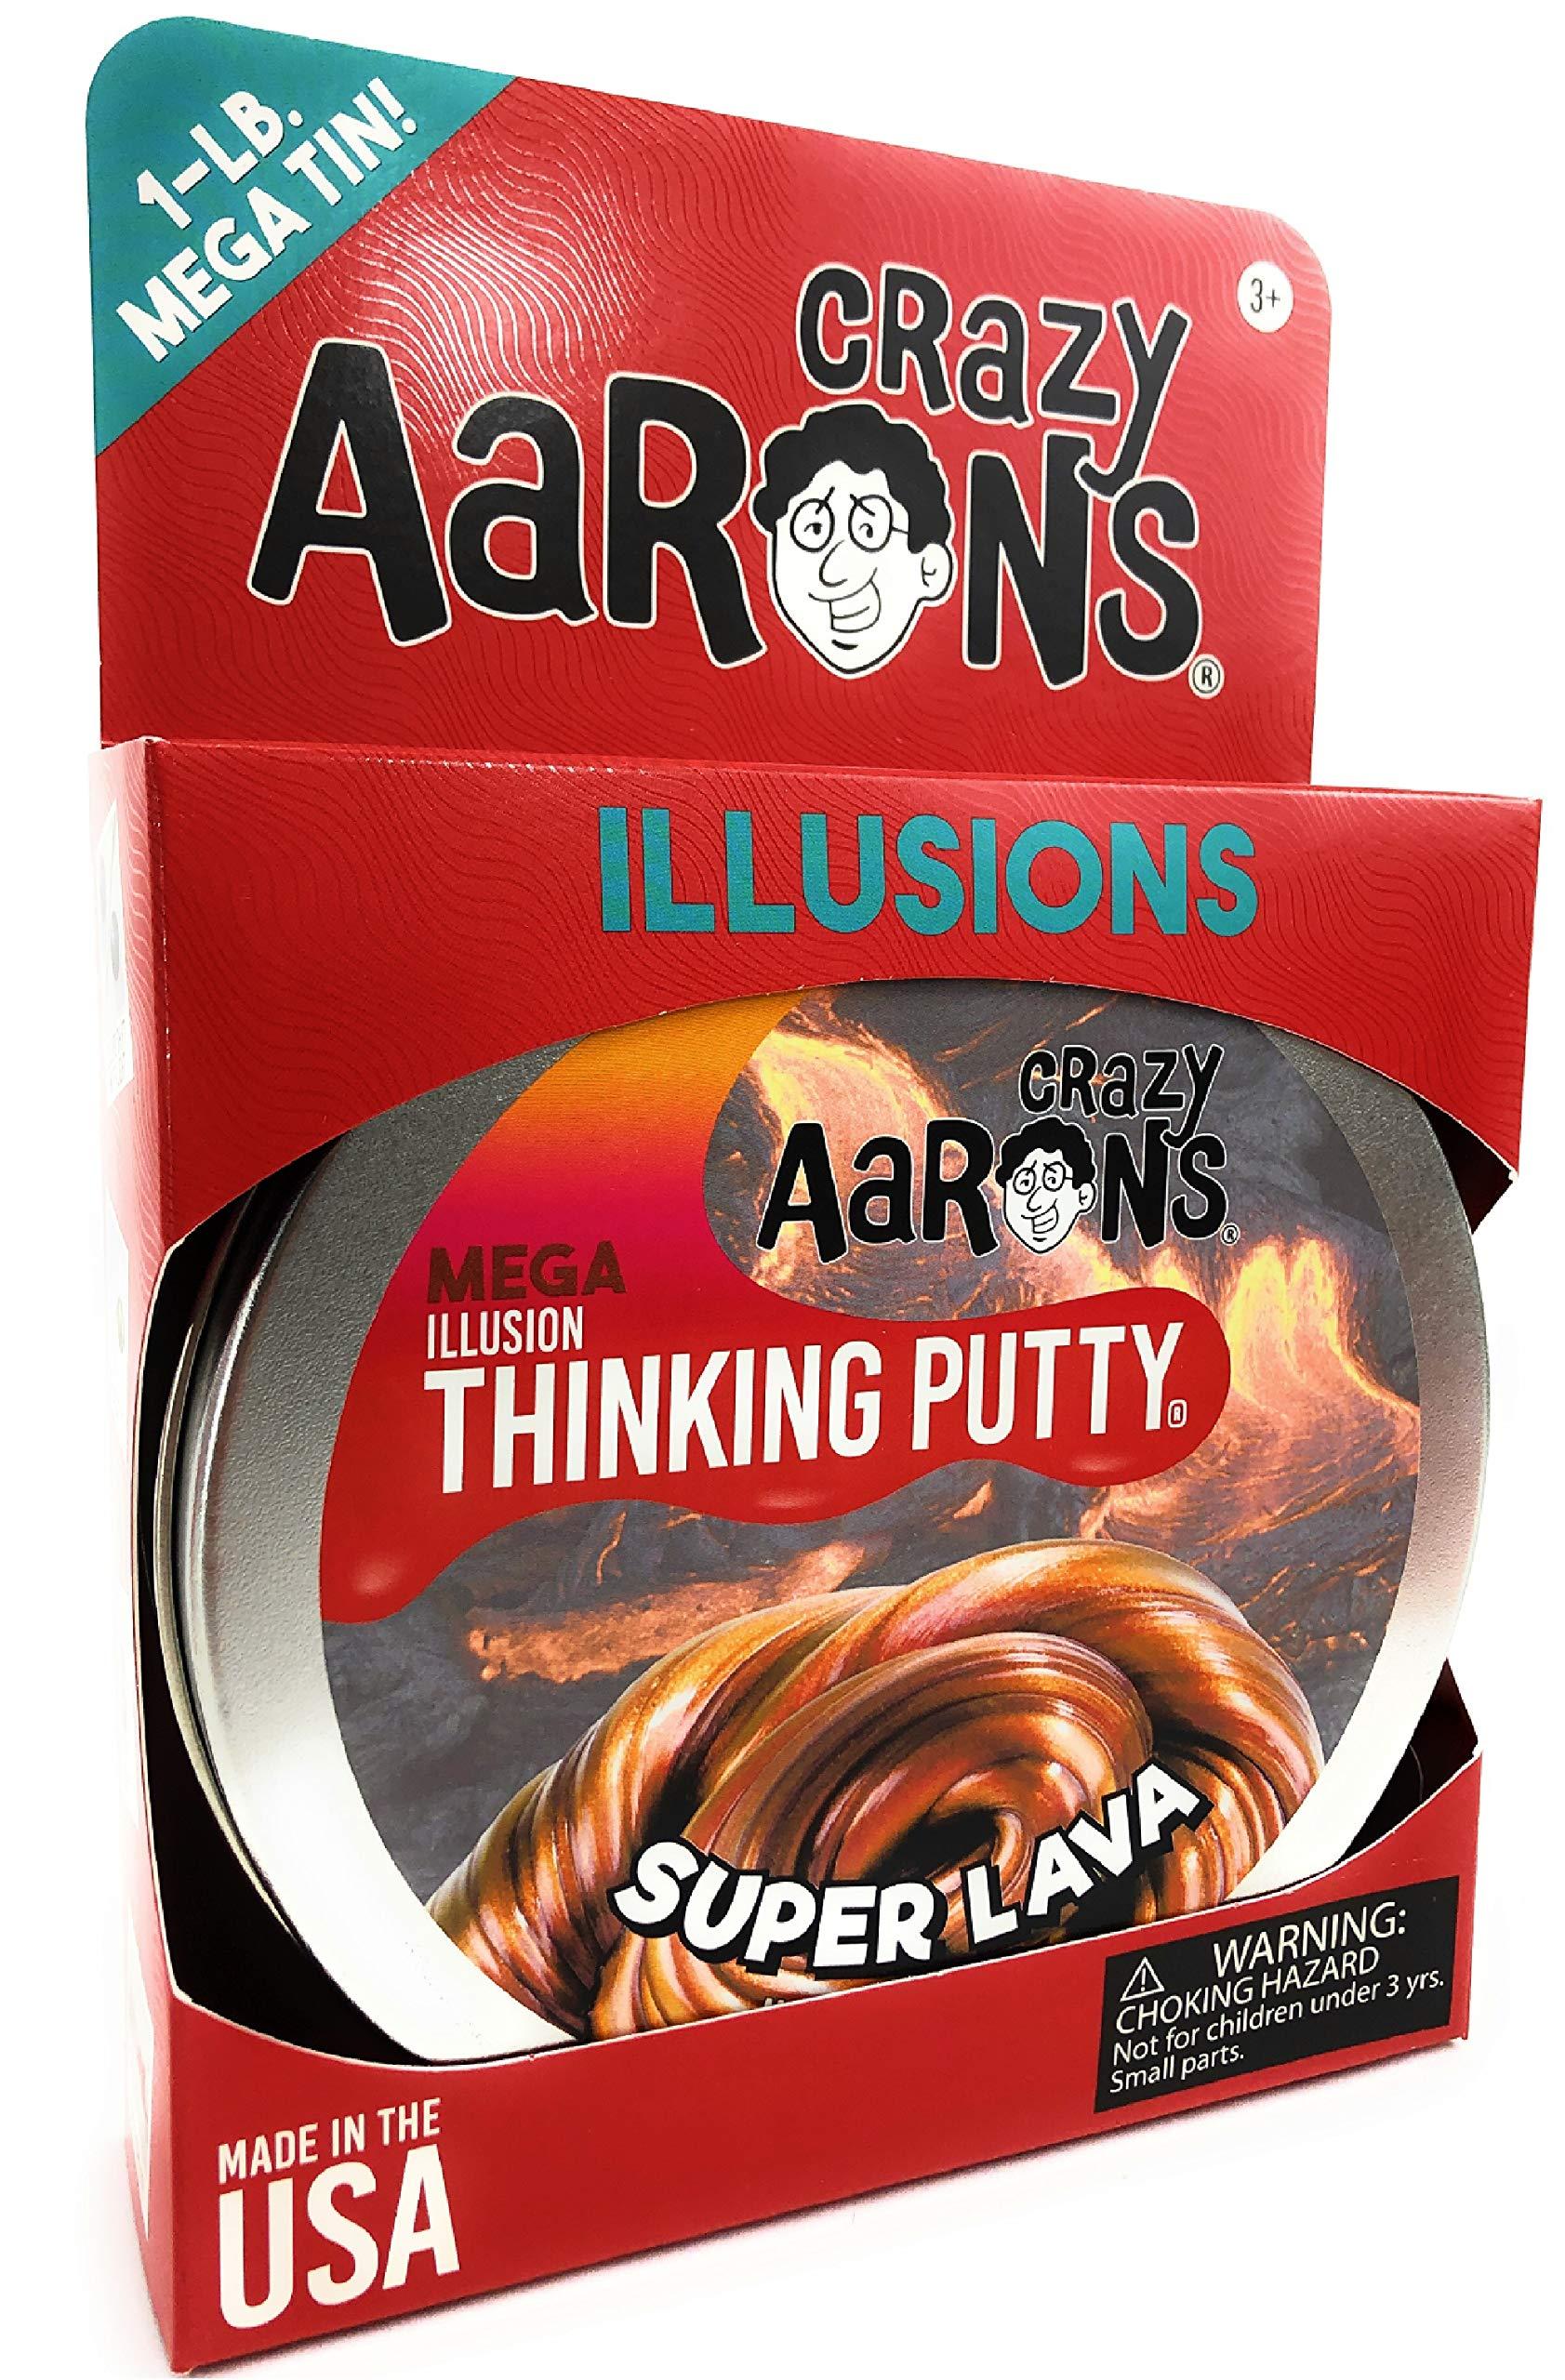 Crazy Aaron's Thinking Putty - Super Lava MEGA Tin - 1 LB Tin by Crazy Aaron's (Image #4)